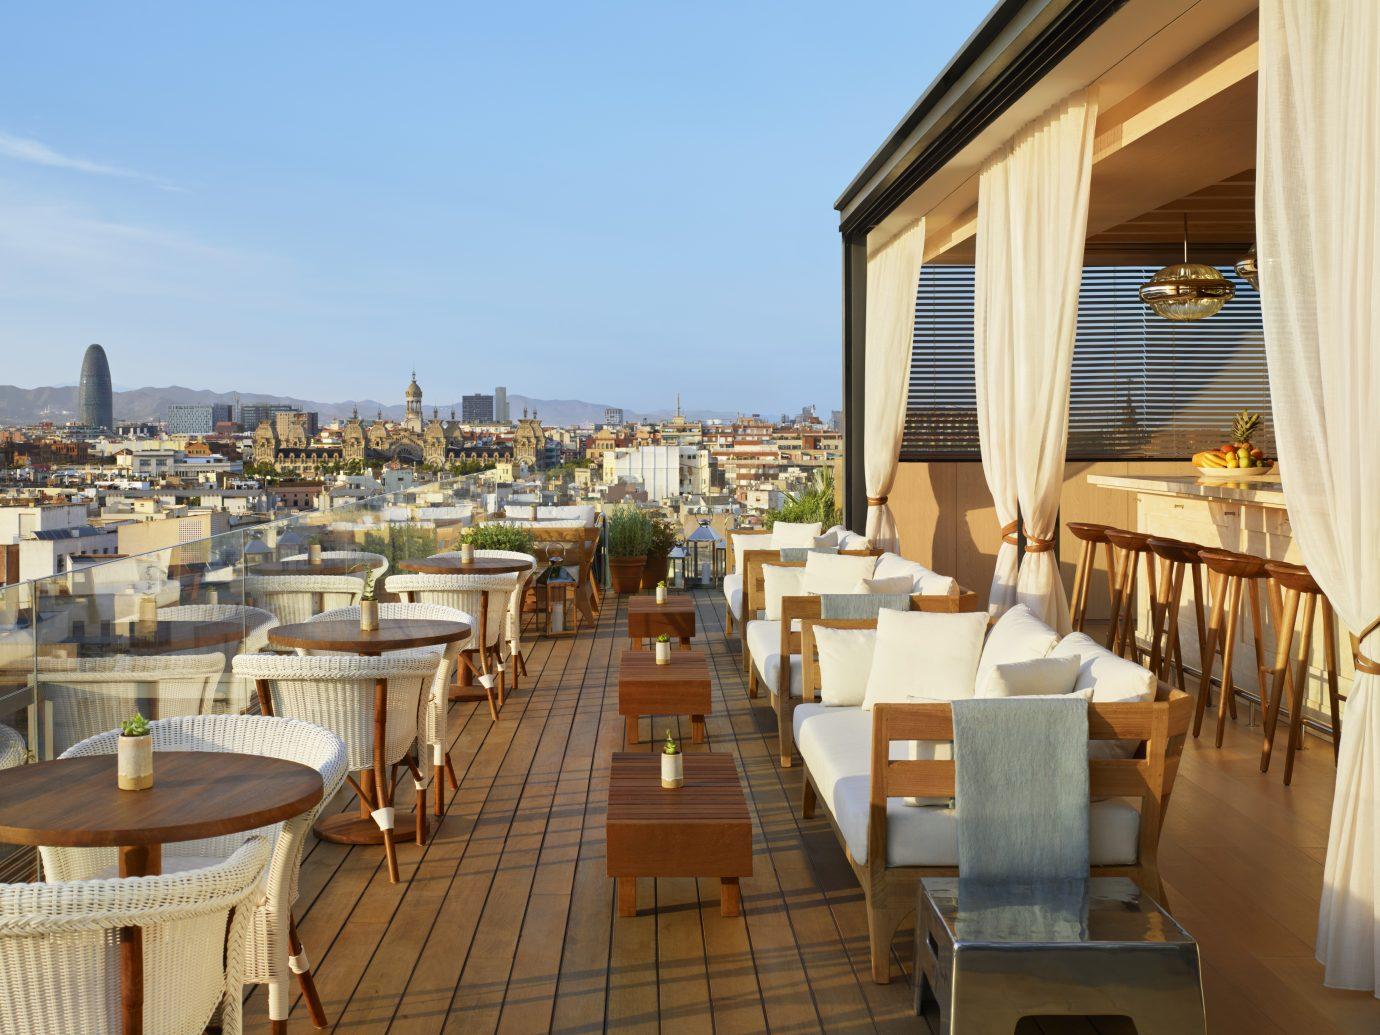 Barcelona EDITION rooftop